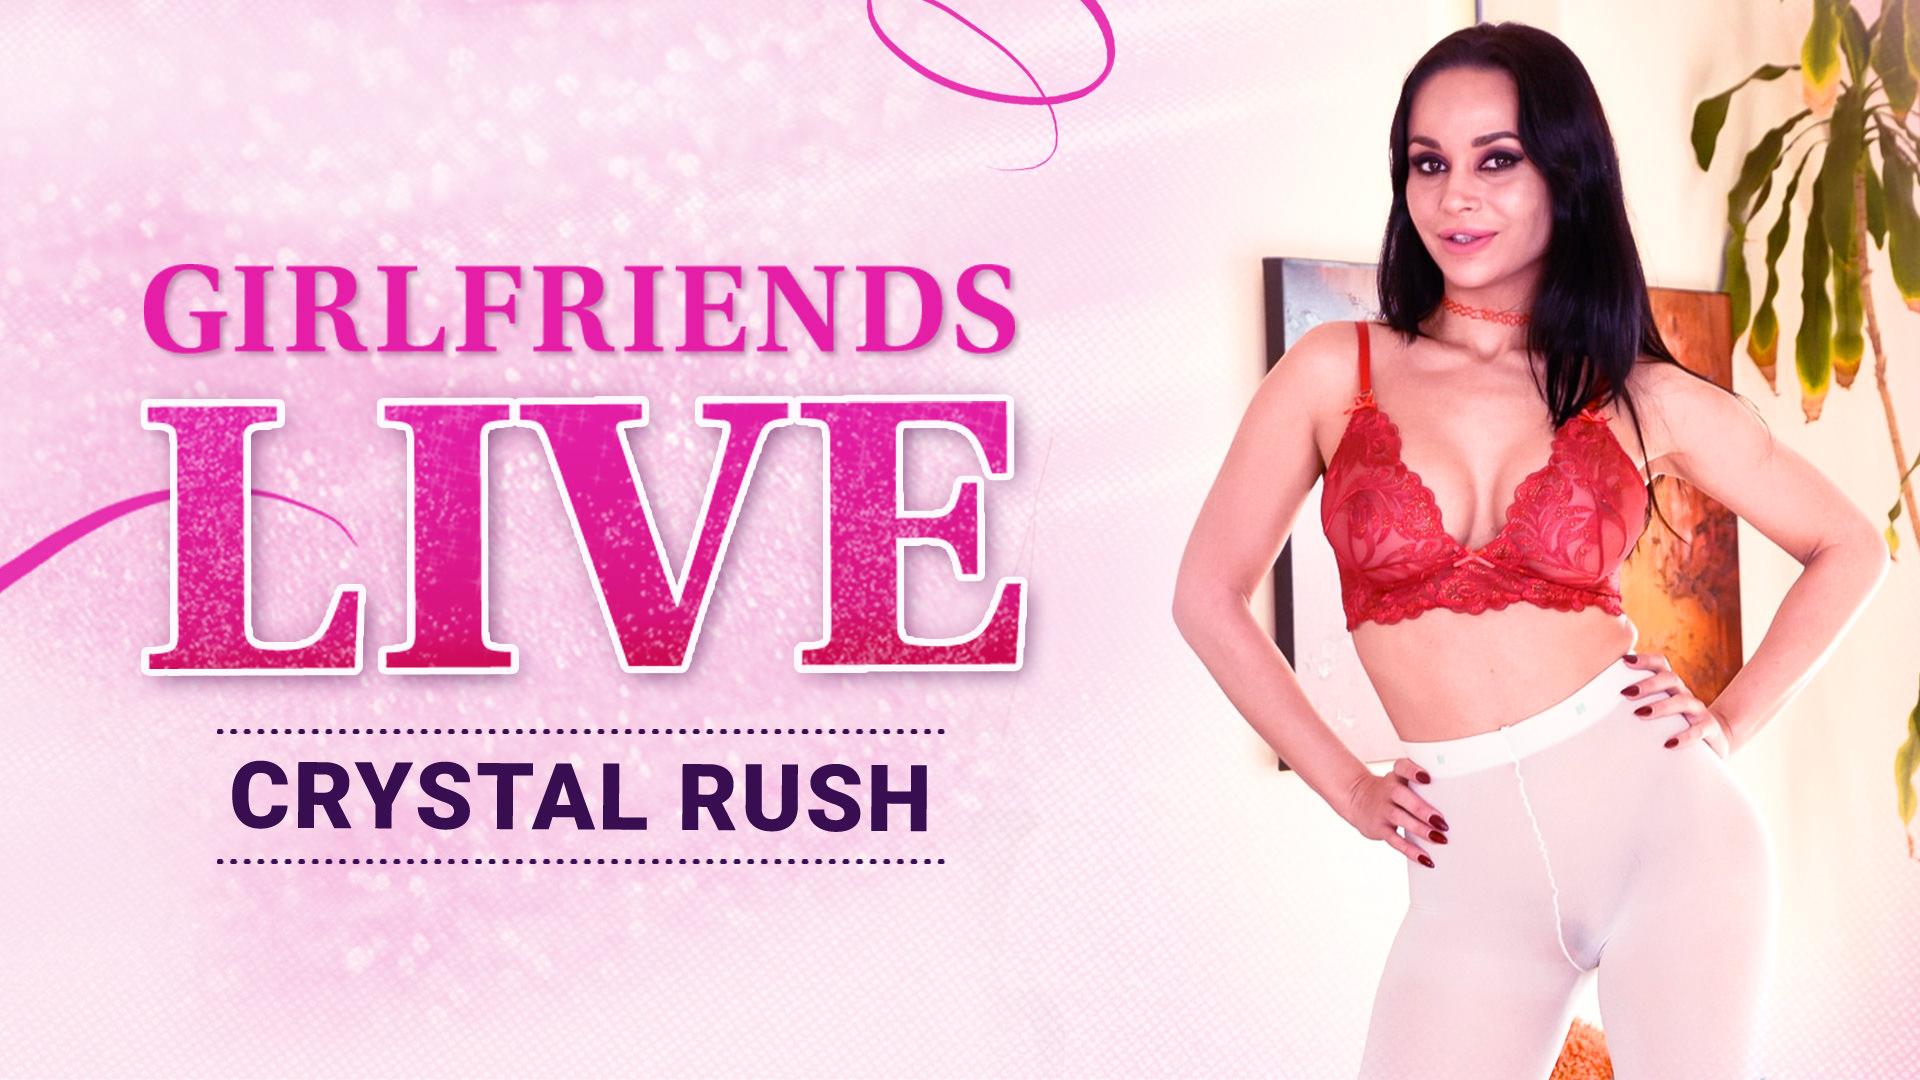 Girlfriends Live - Crystal Rush, Scene #01 - Girlfriends Films